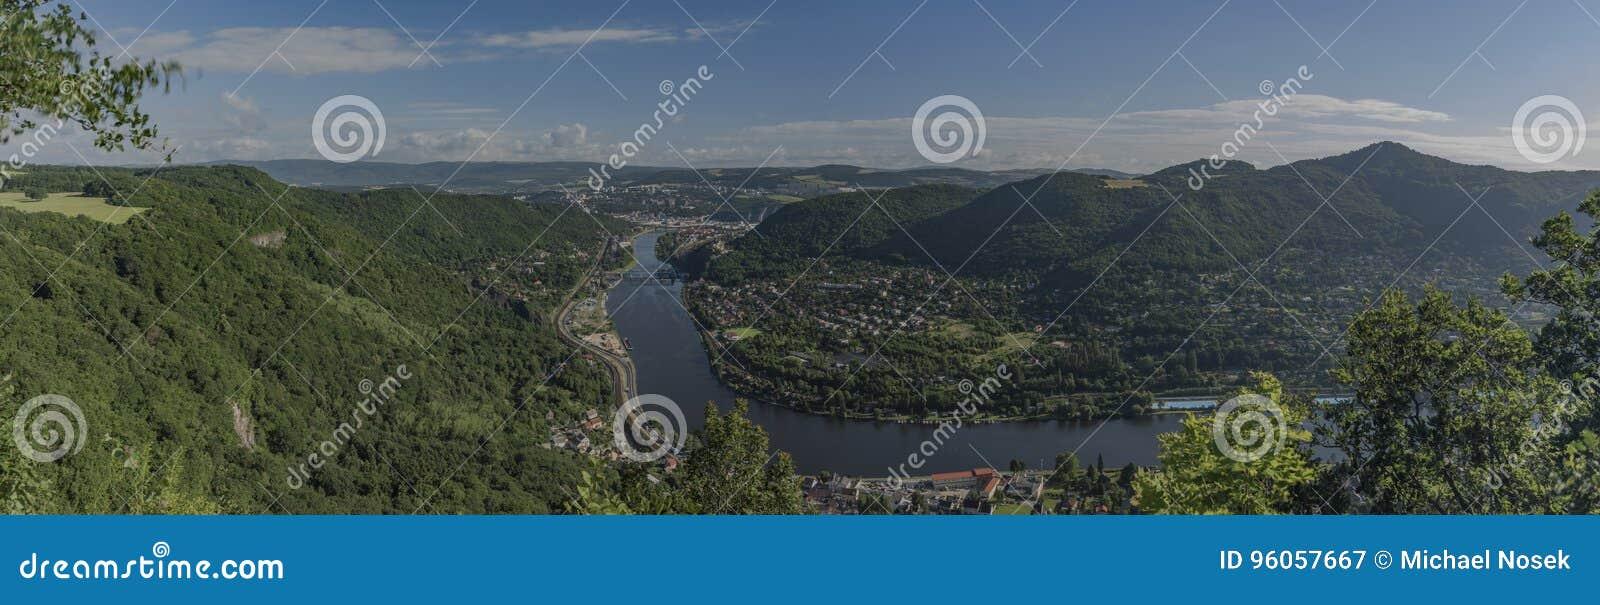 Взгляд для долины реки Labe